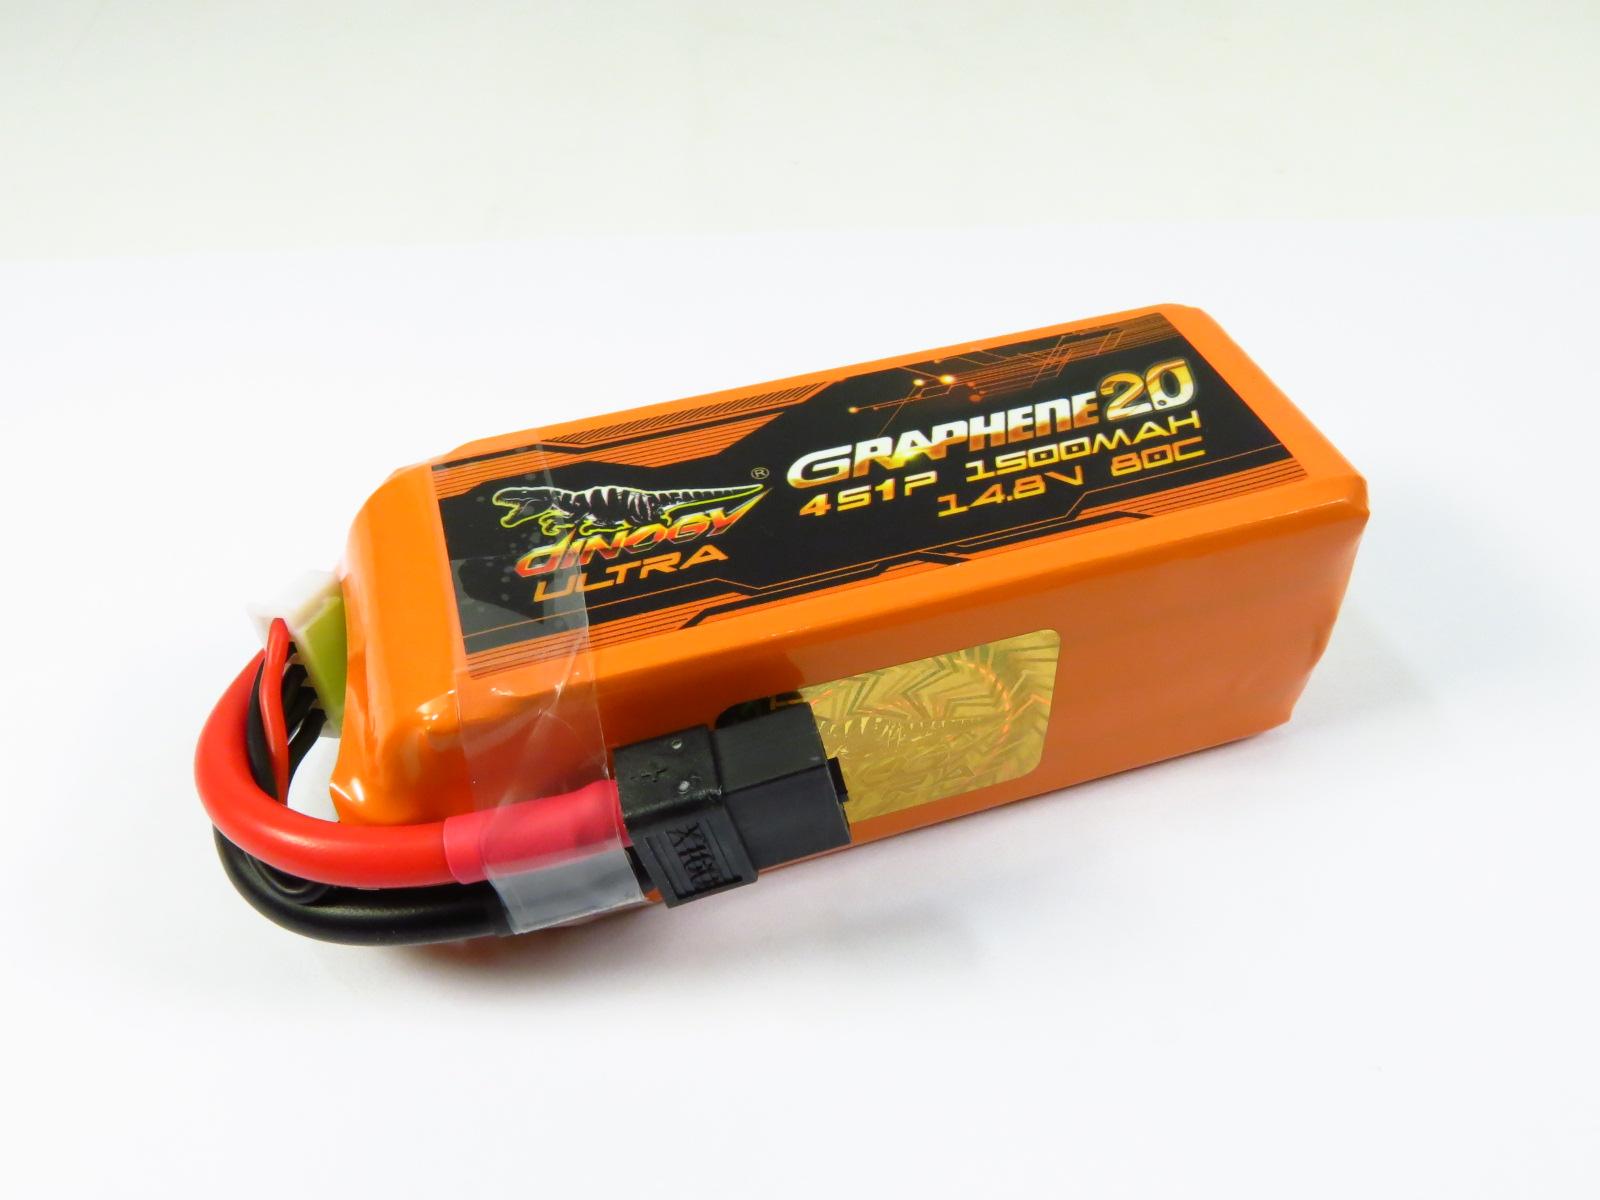 DINOGY ダイノジー ULTRA Graphene 2.0 リポバッテリー 14.8V1500mAh 80C (LC-4S1500XTU)FPVレーサーに最適